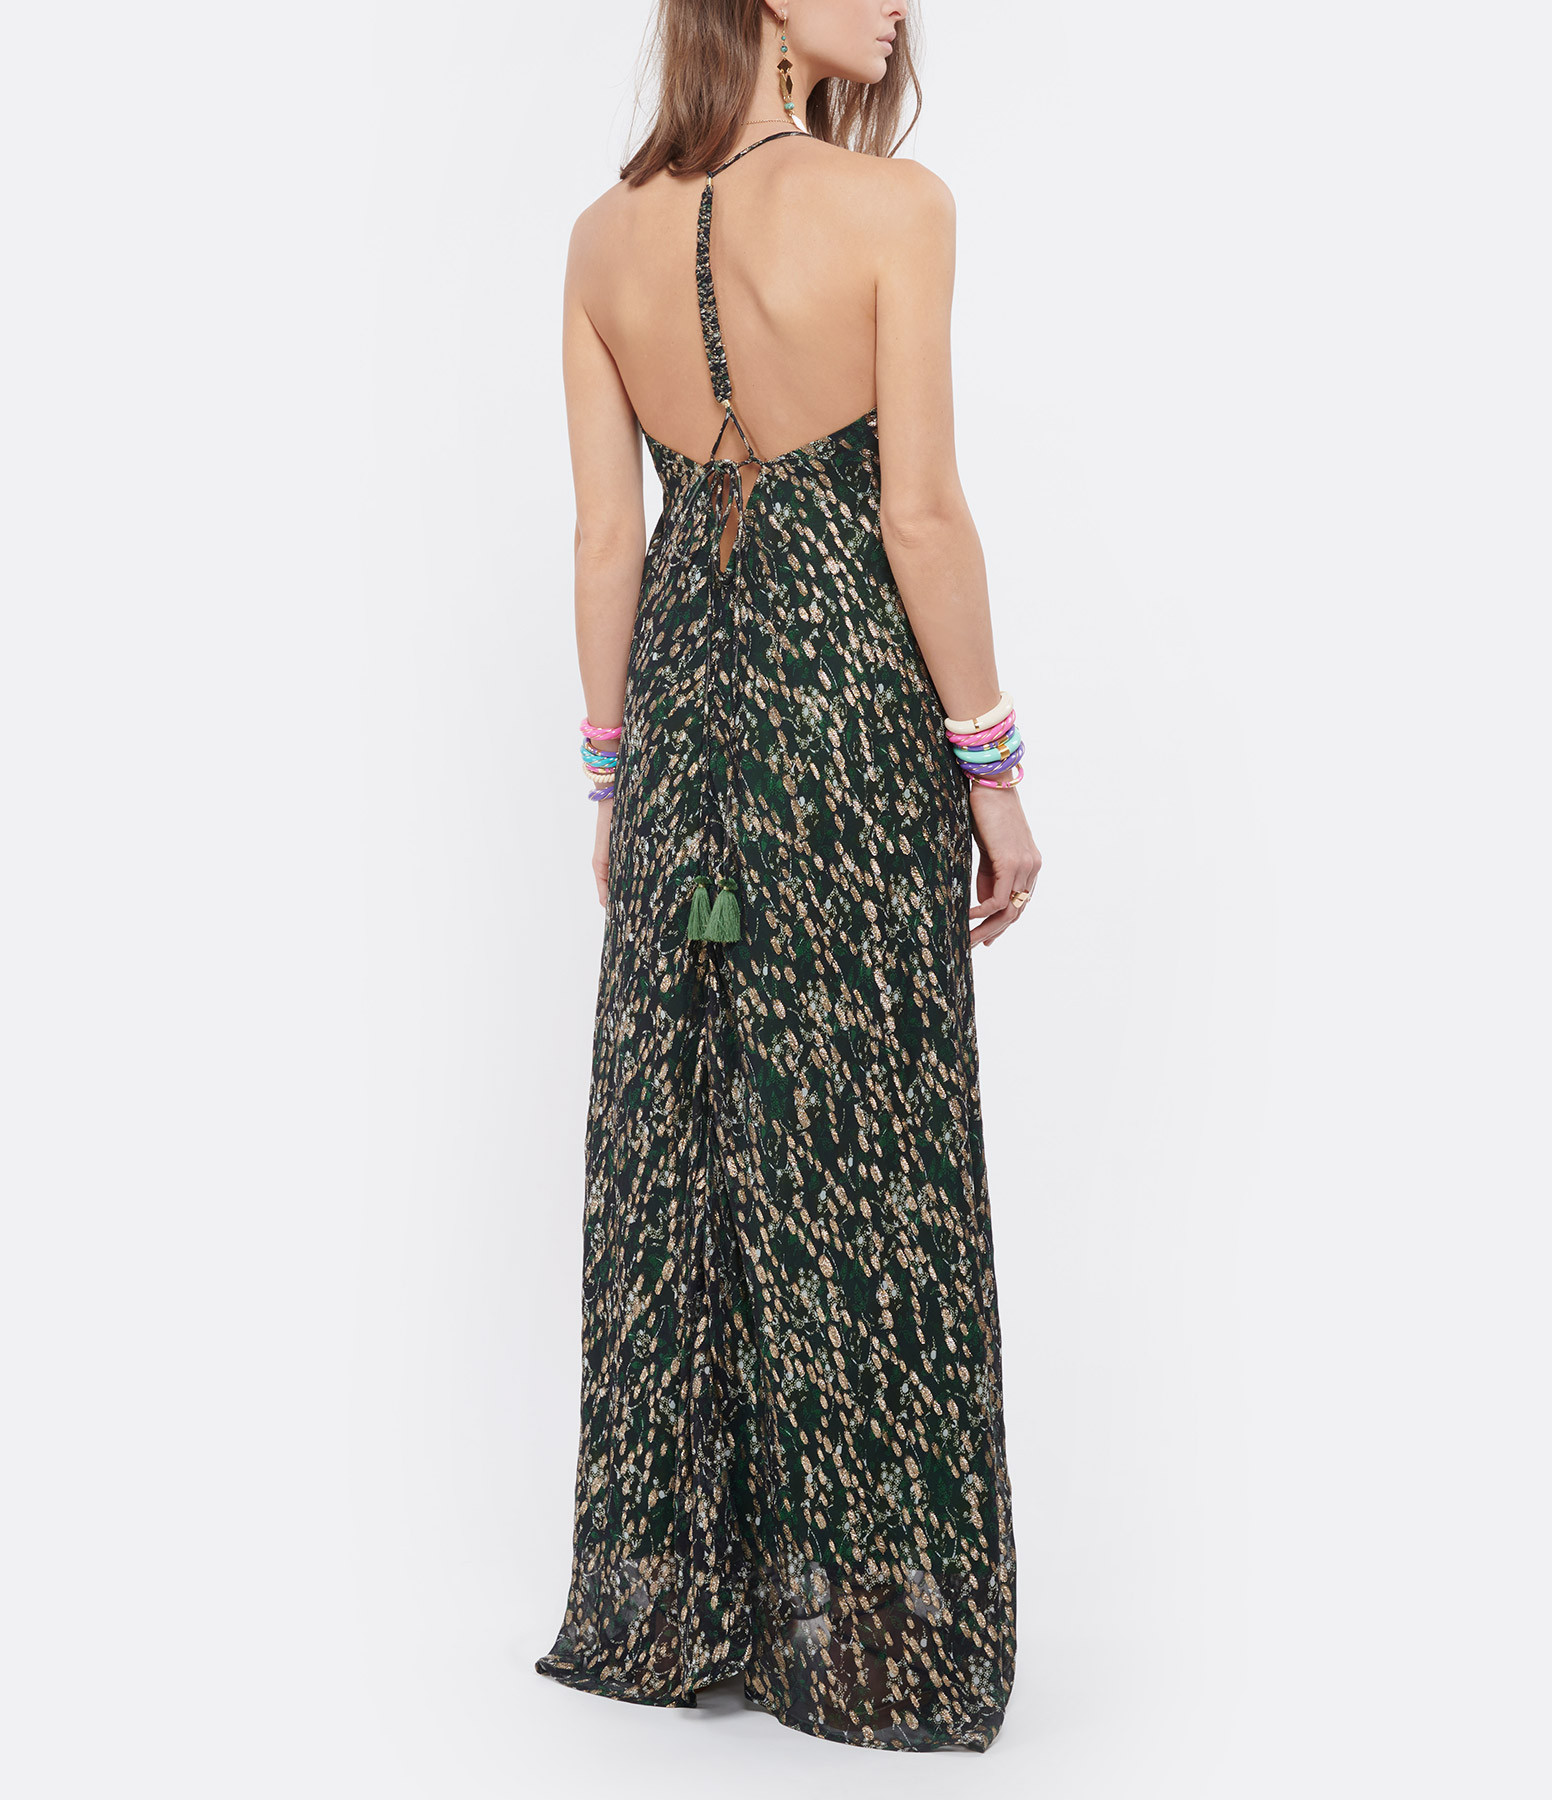 MARE DI LATTE - Robe Isabella Lurex Imprimé Floral